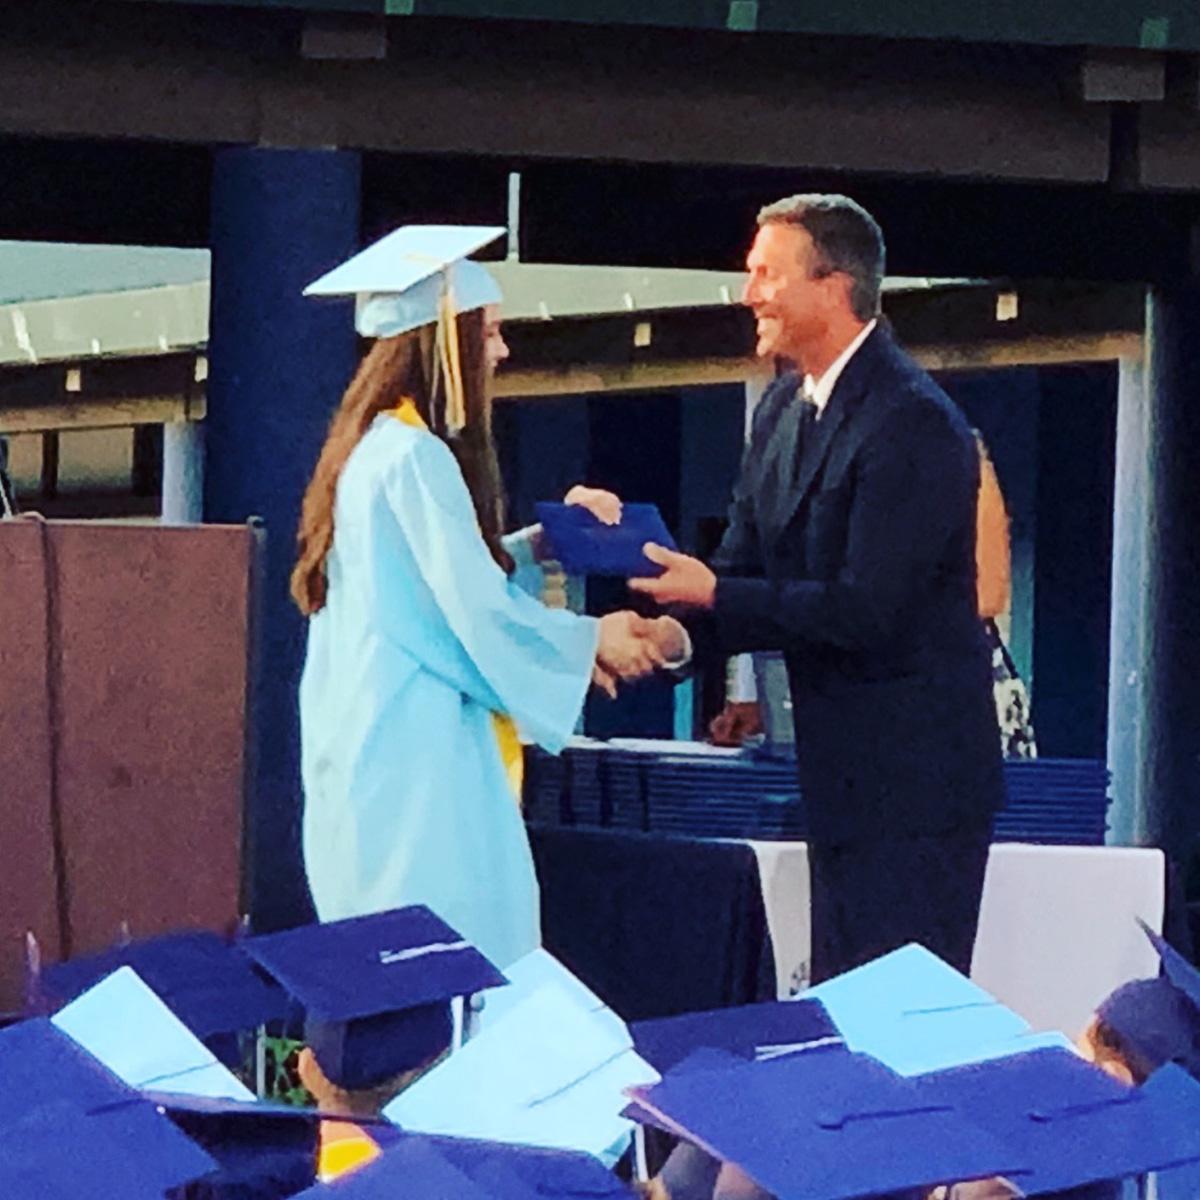 OHS Graduation - Alexandra